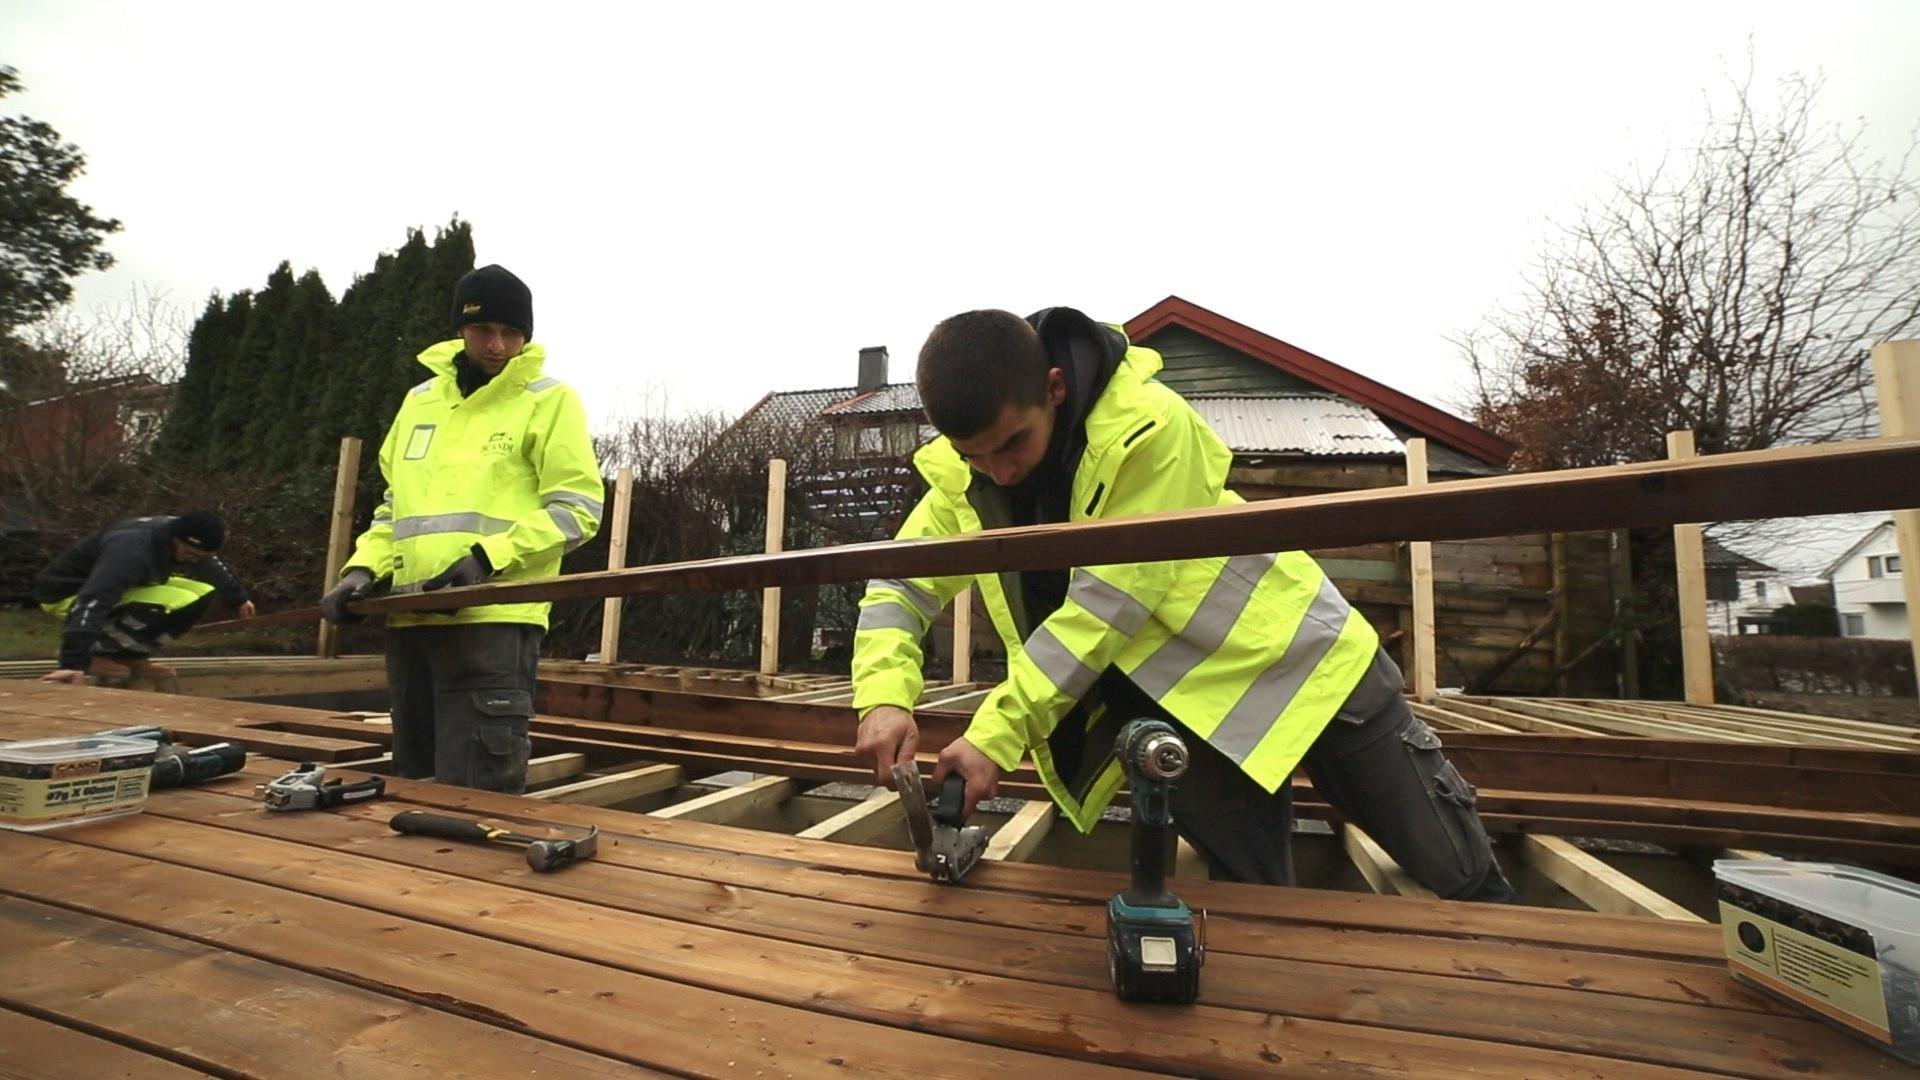 Film promocyjny firmy budowlanej Scandi Hus og Hage